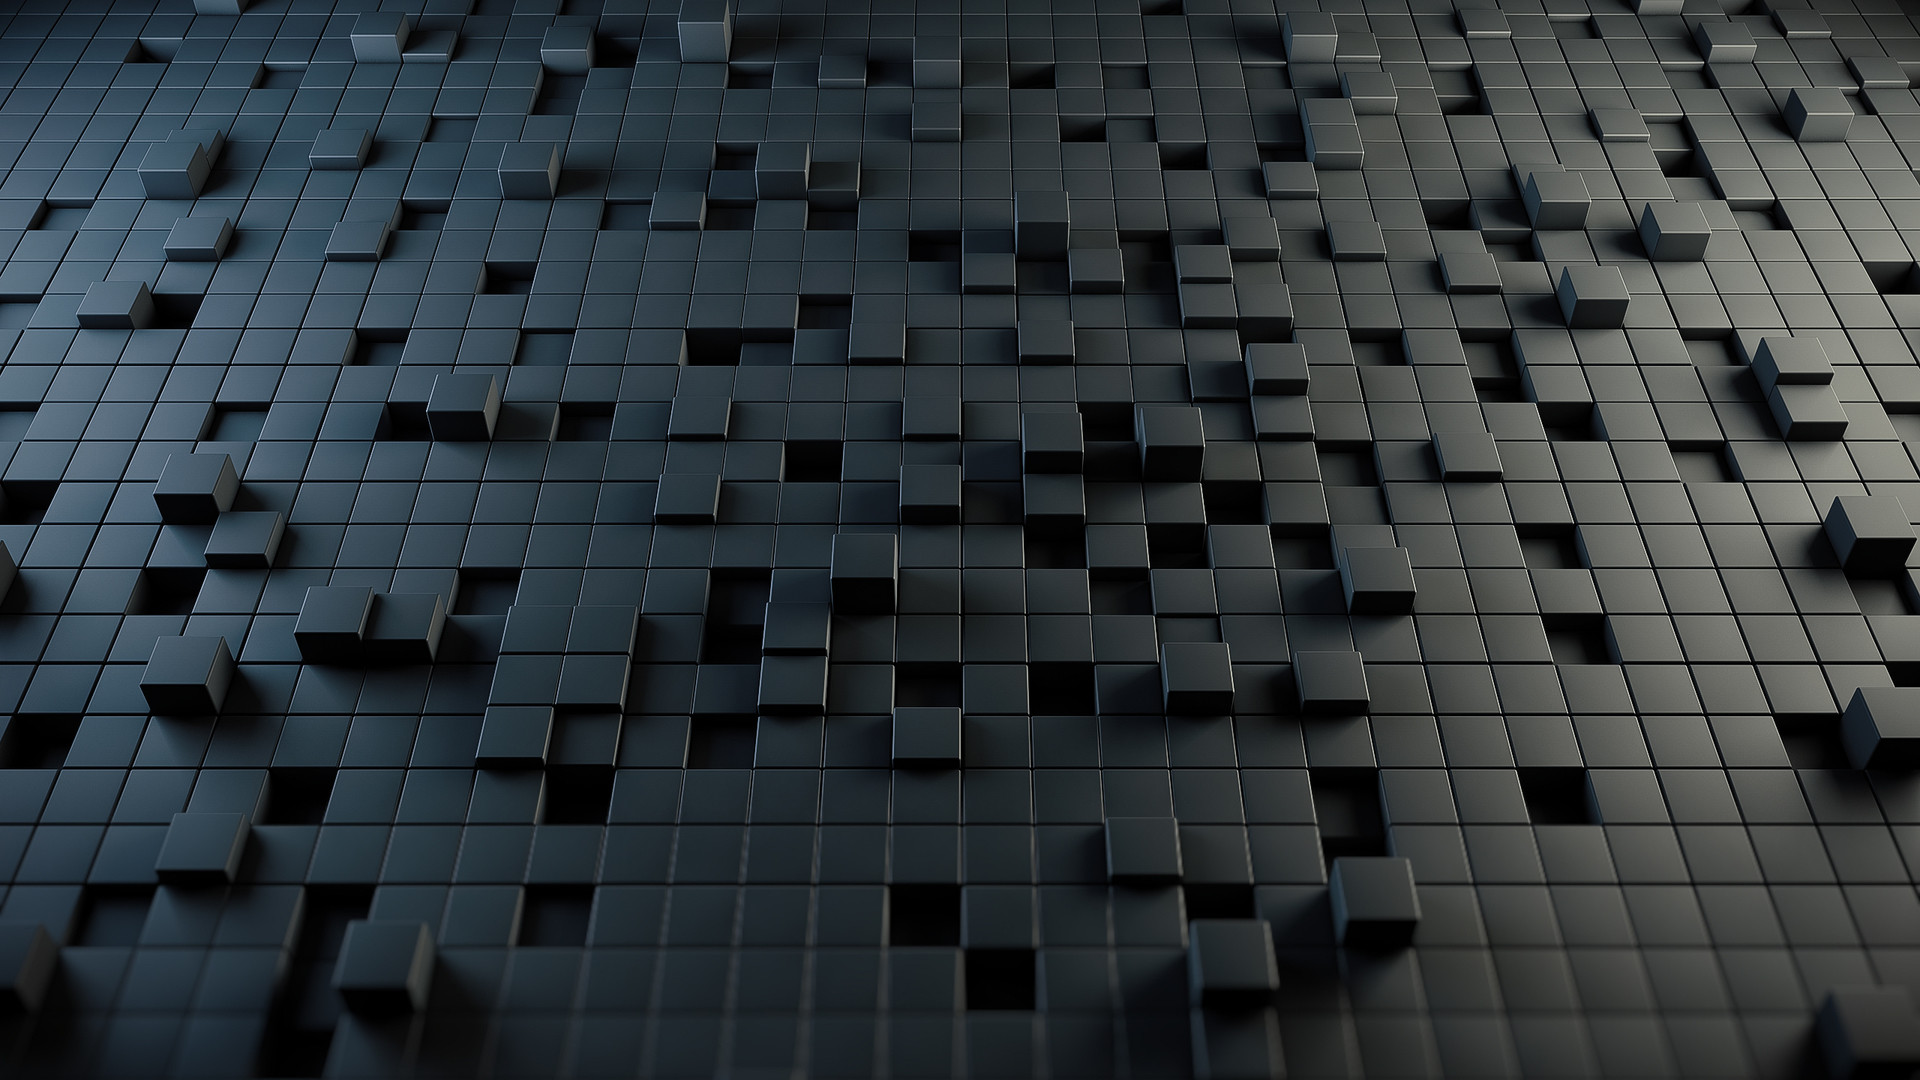 Black Cubes Wallpaper Full HD